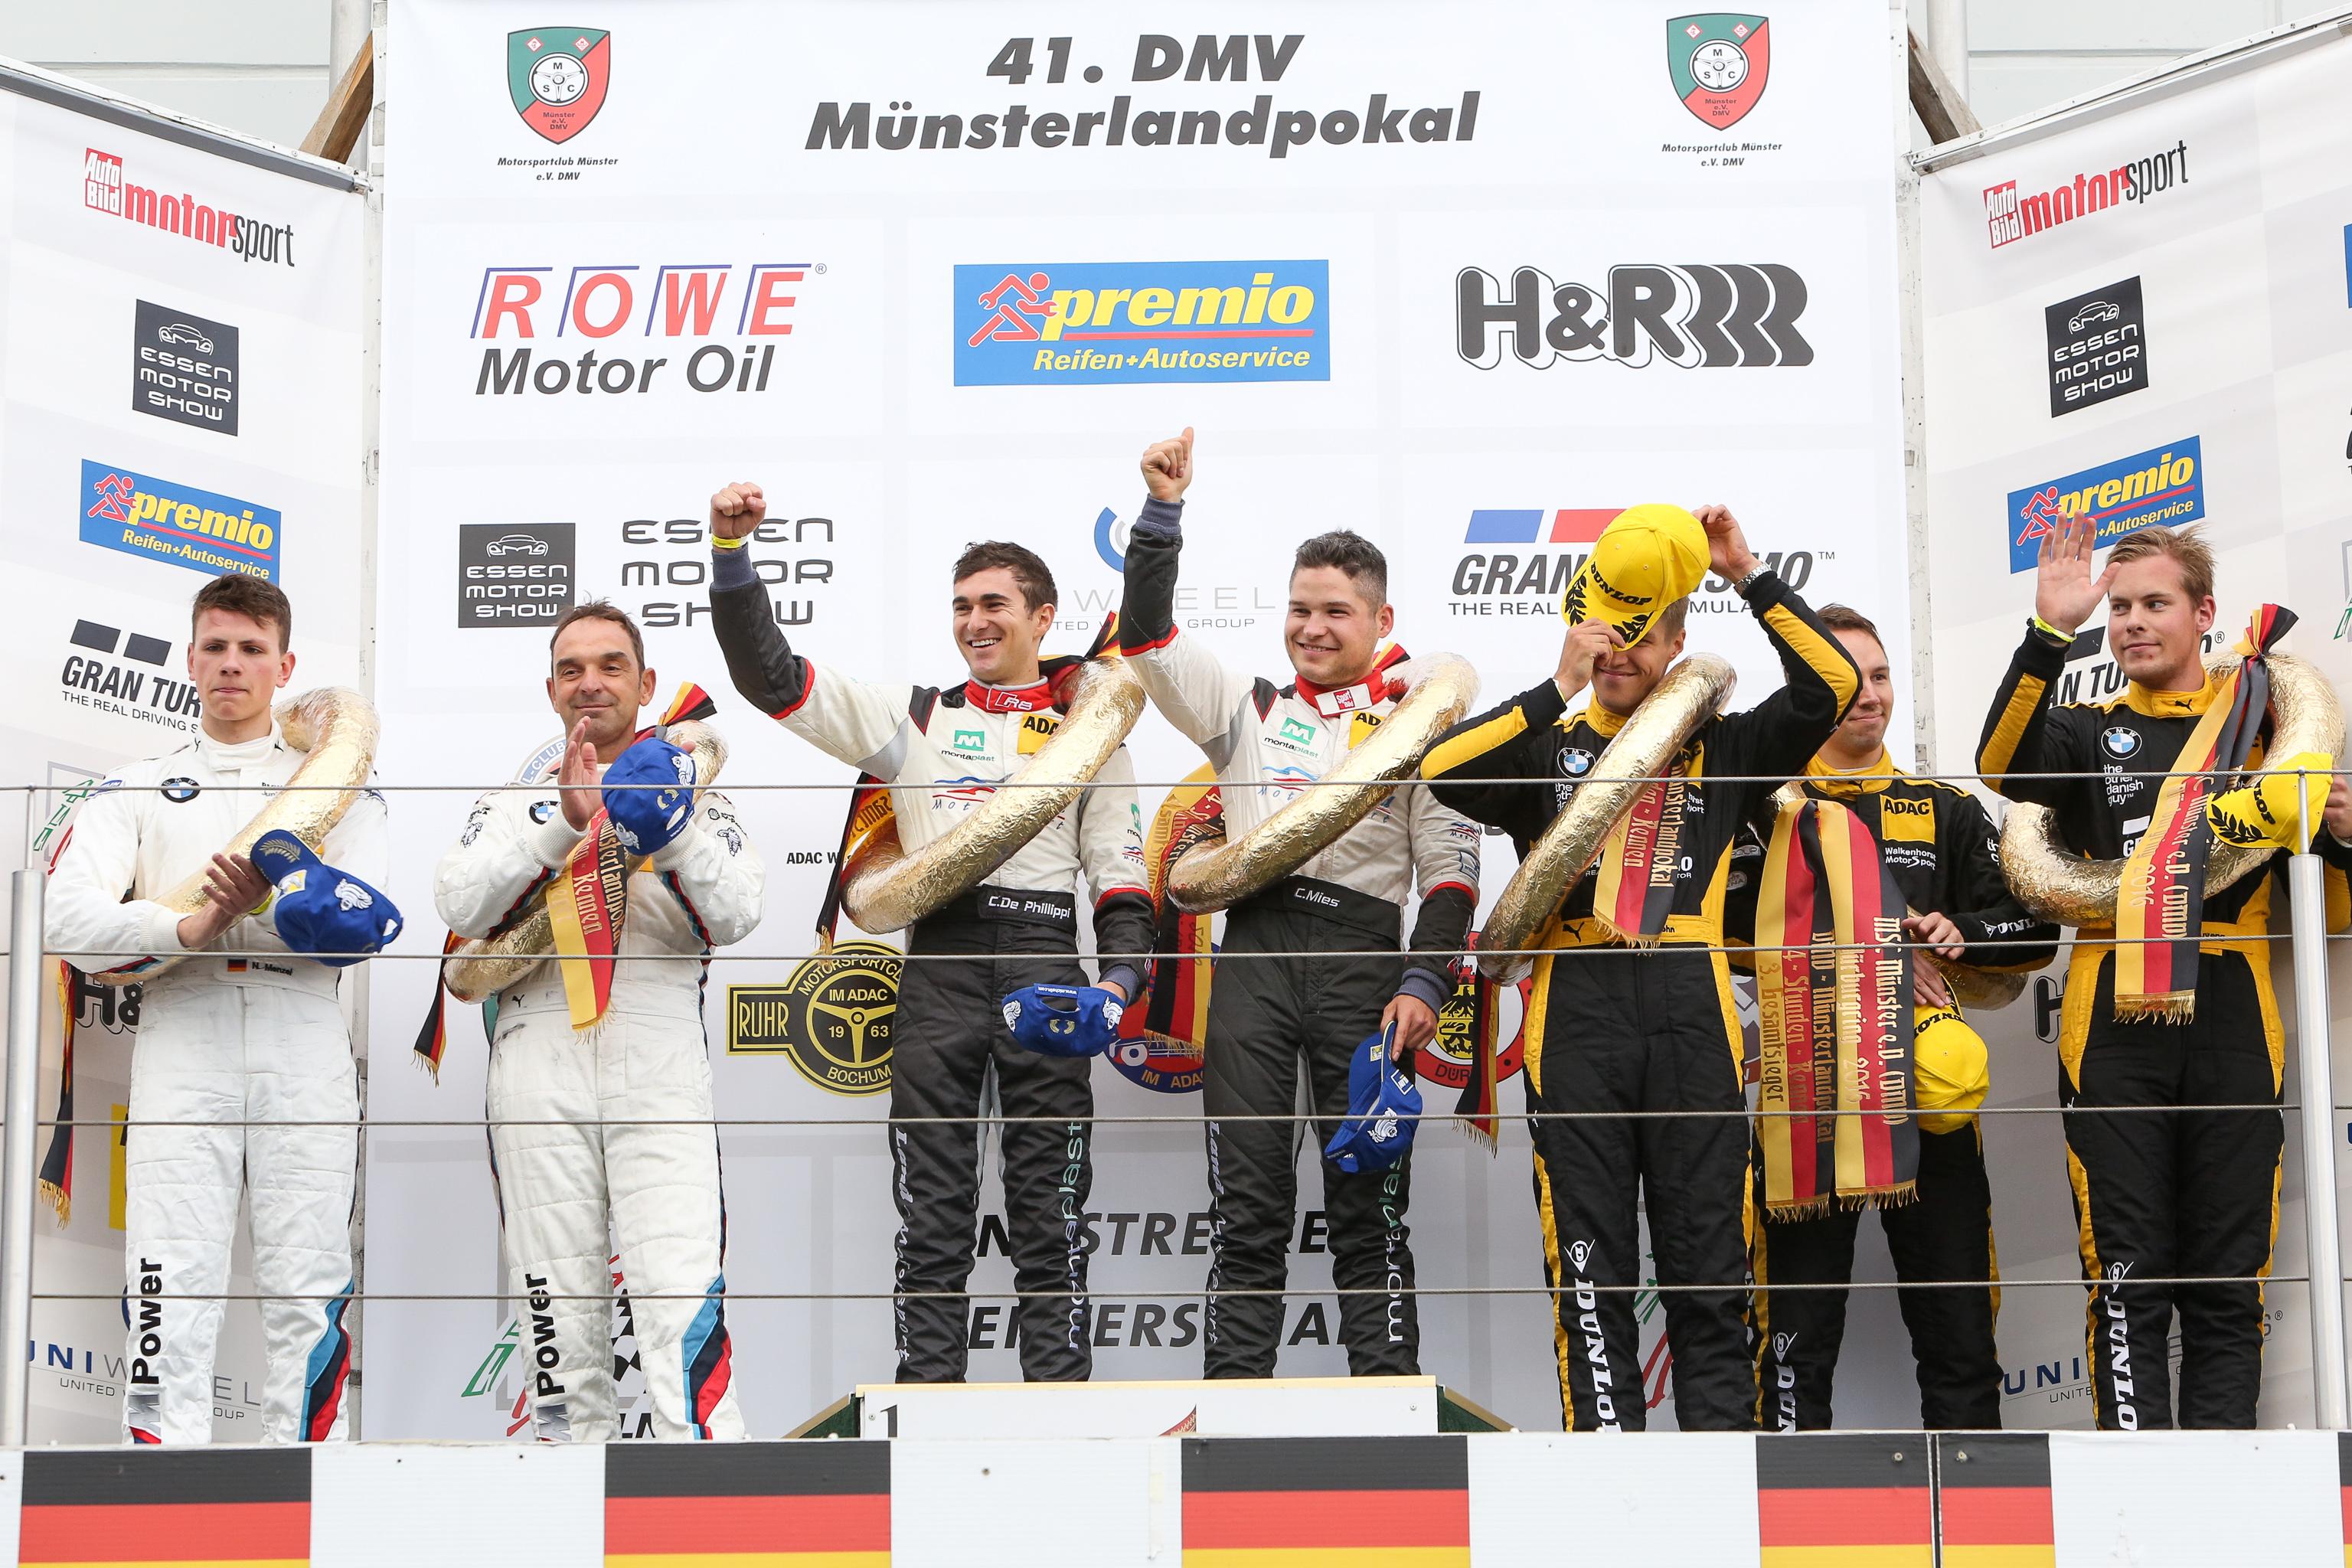 VLN Langstreckenmeisterschaft Nuerburgring 2016, 41. DMV MŸnsterlandpokal (2016-10-22): Siegerehrung. Foto: VLN